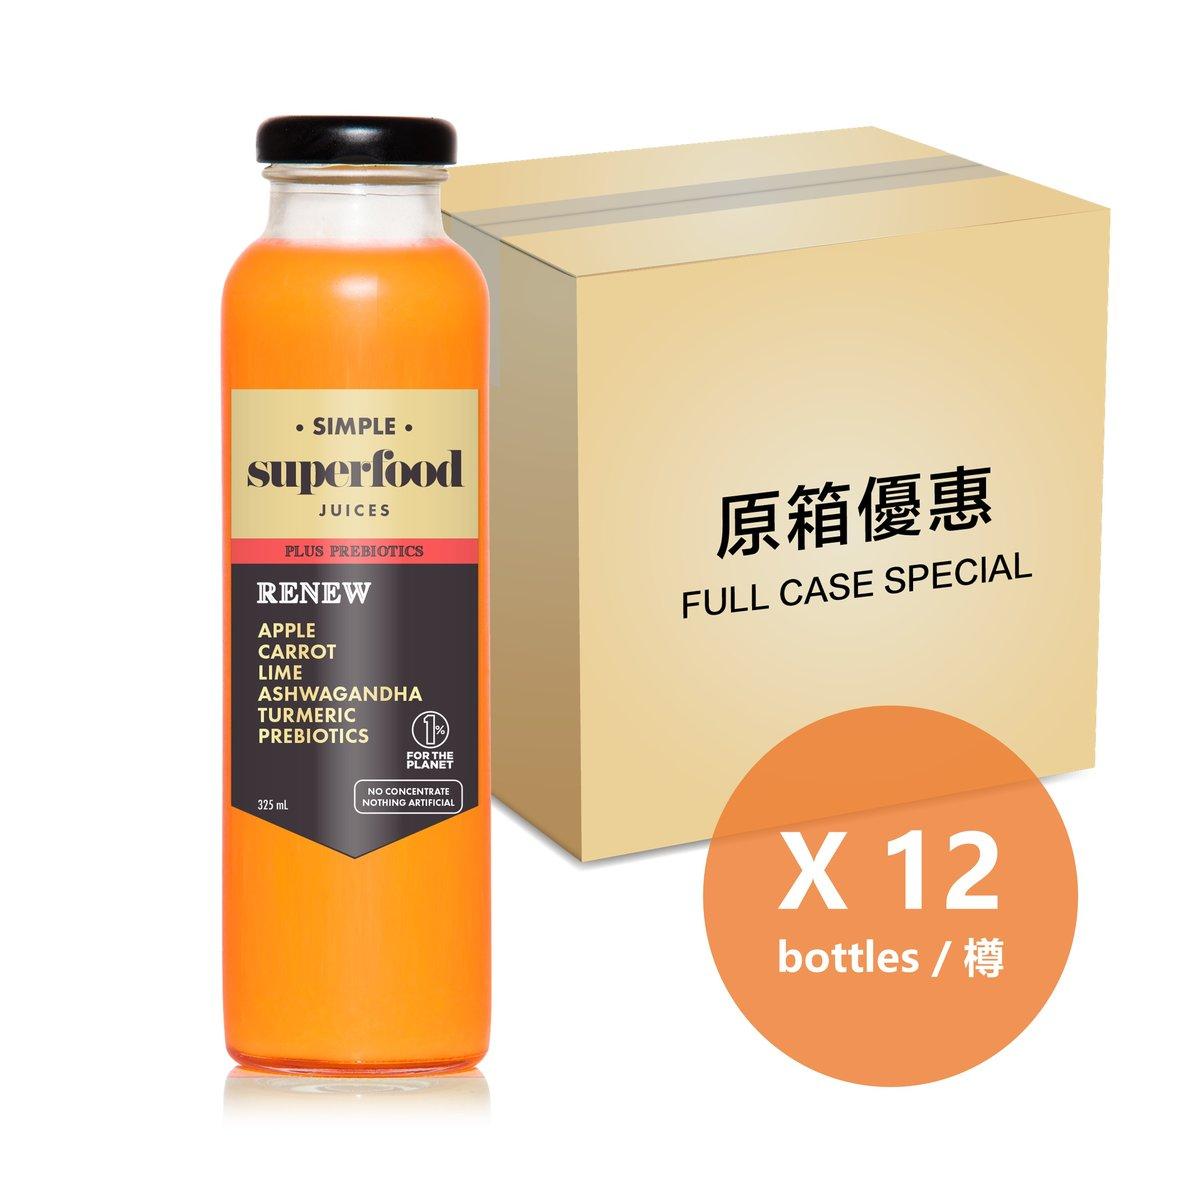 [Full Case] Renew Prebiotic Smoothie - 325ml Bottle